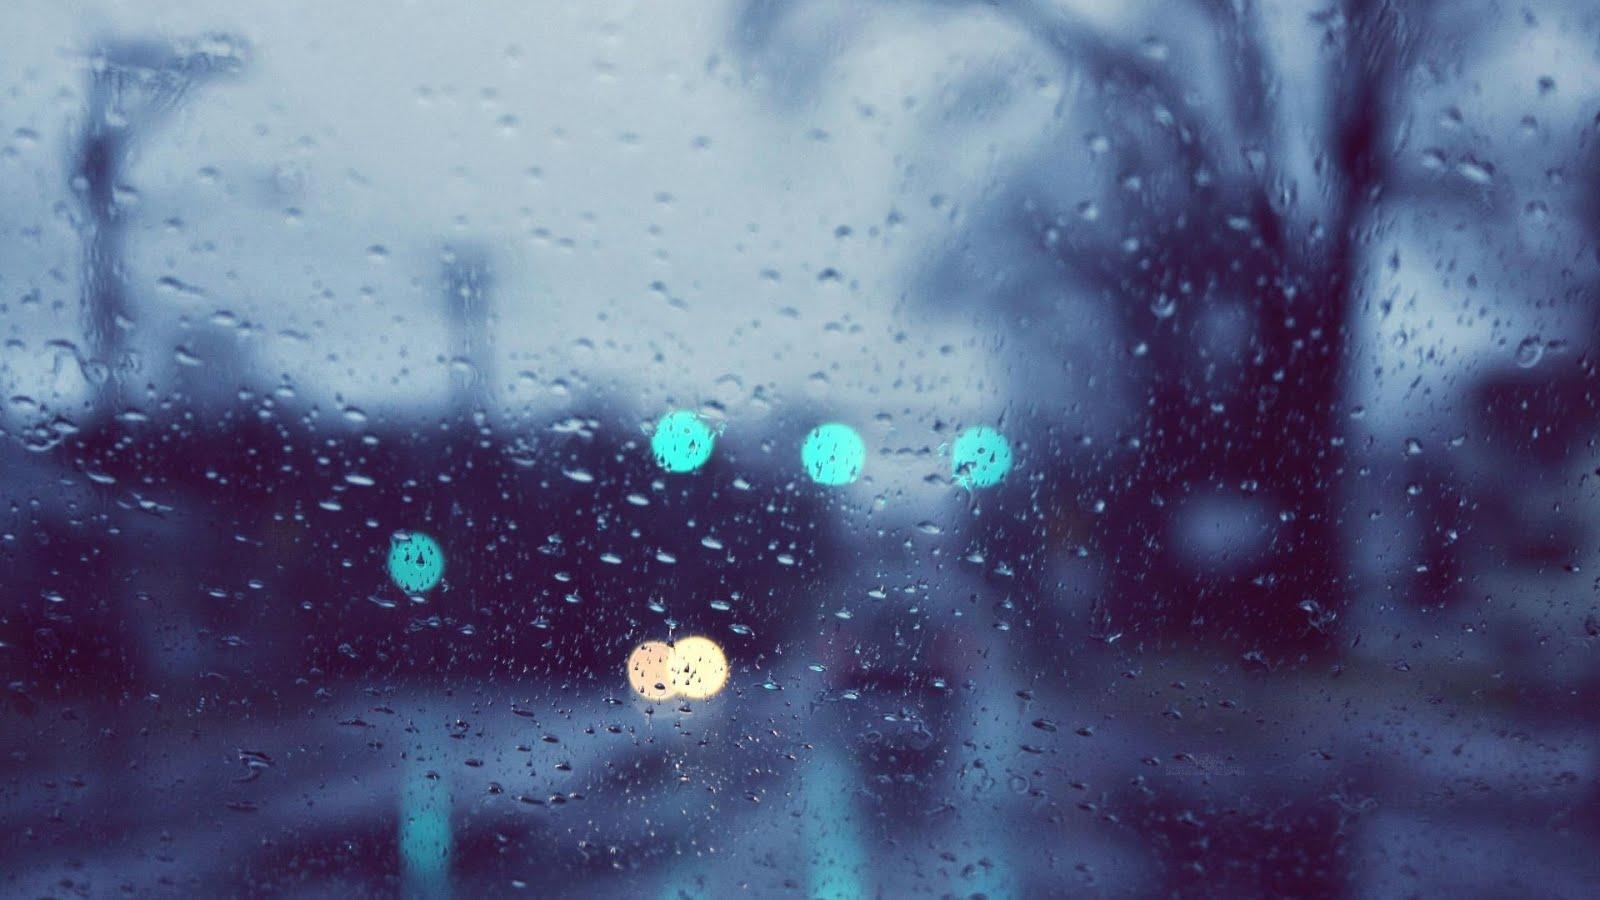 rain_glare_glass_drops_92855_1920x1080.jpg